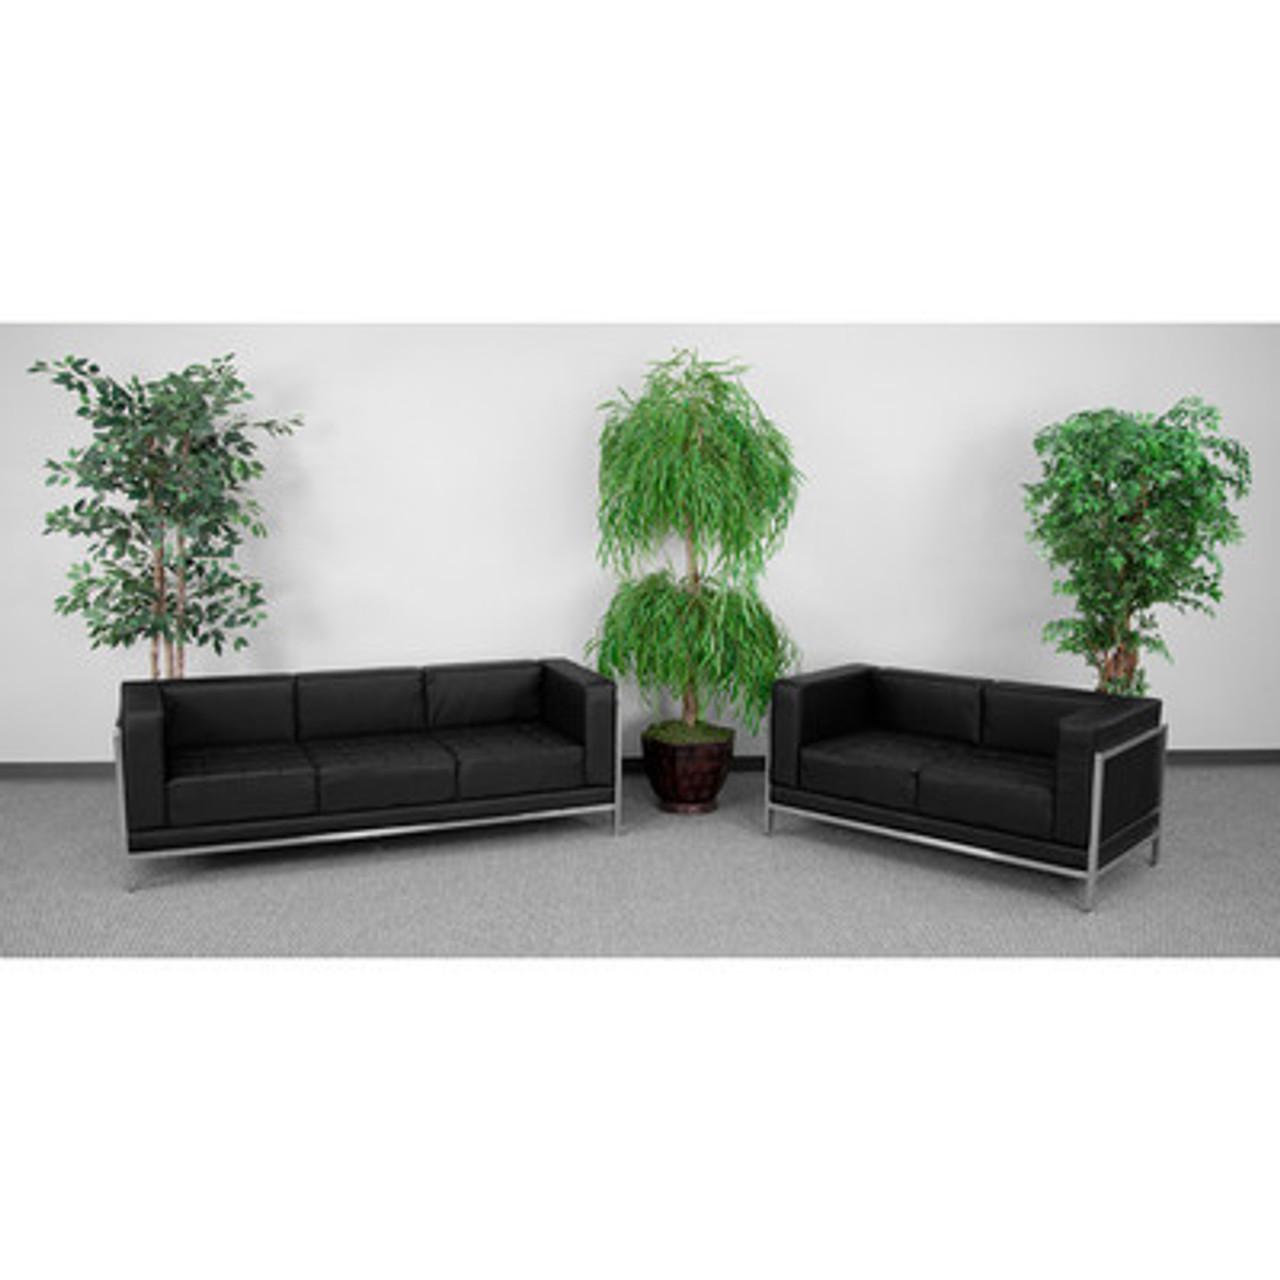 2pc Modern Leather Office Reception Sofa Set, FF-0433-12-S4